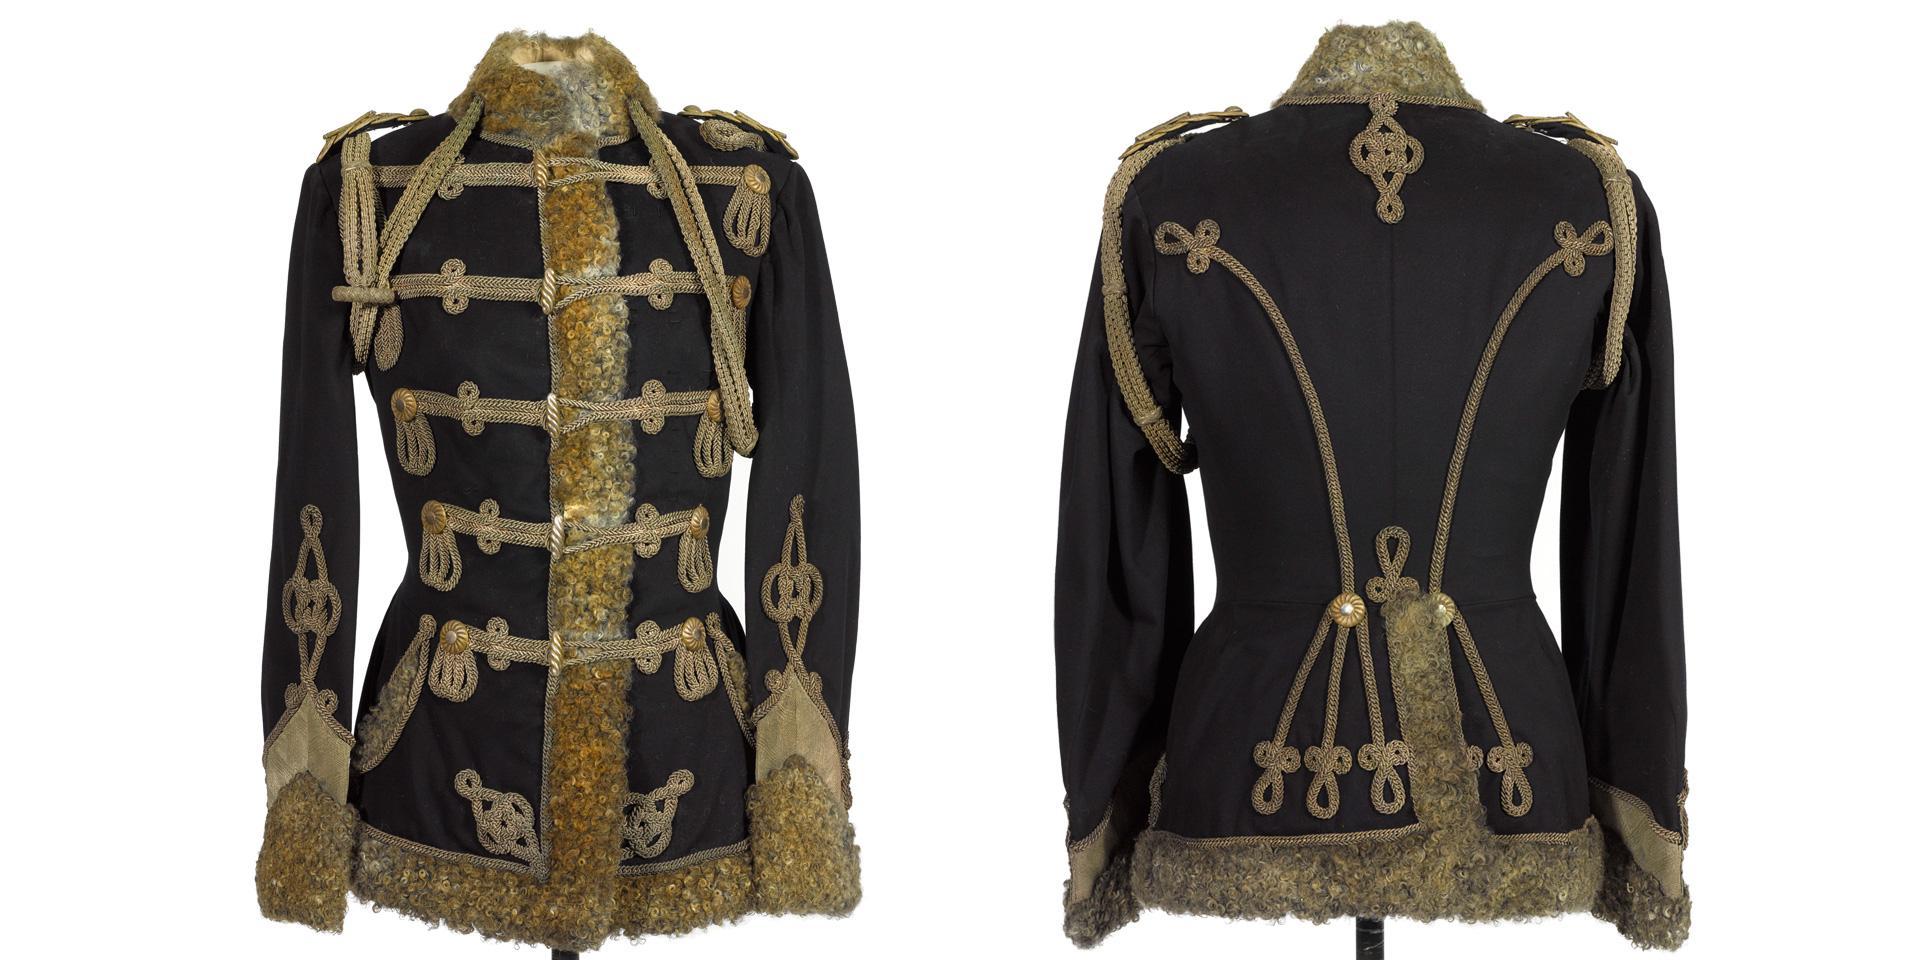 Pelisse, 3rd Zieten Hussars, worn by The Duke of Connaught, 1900s